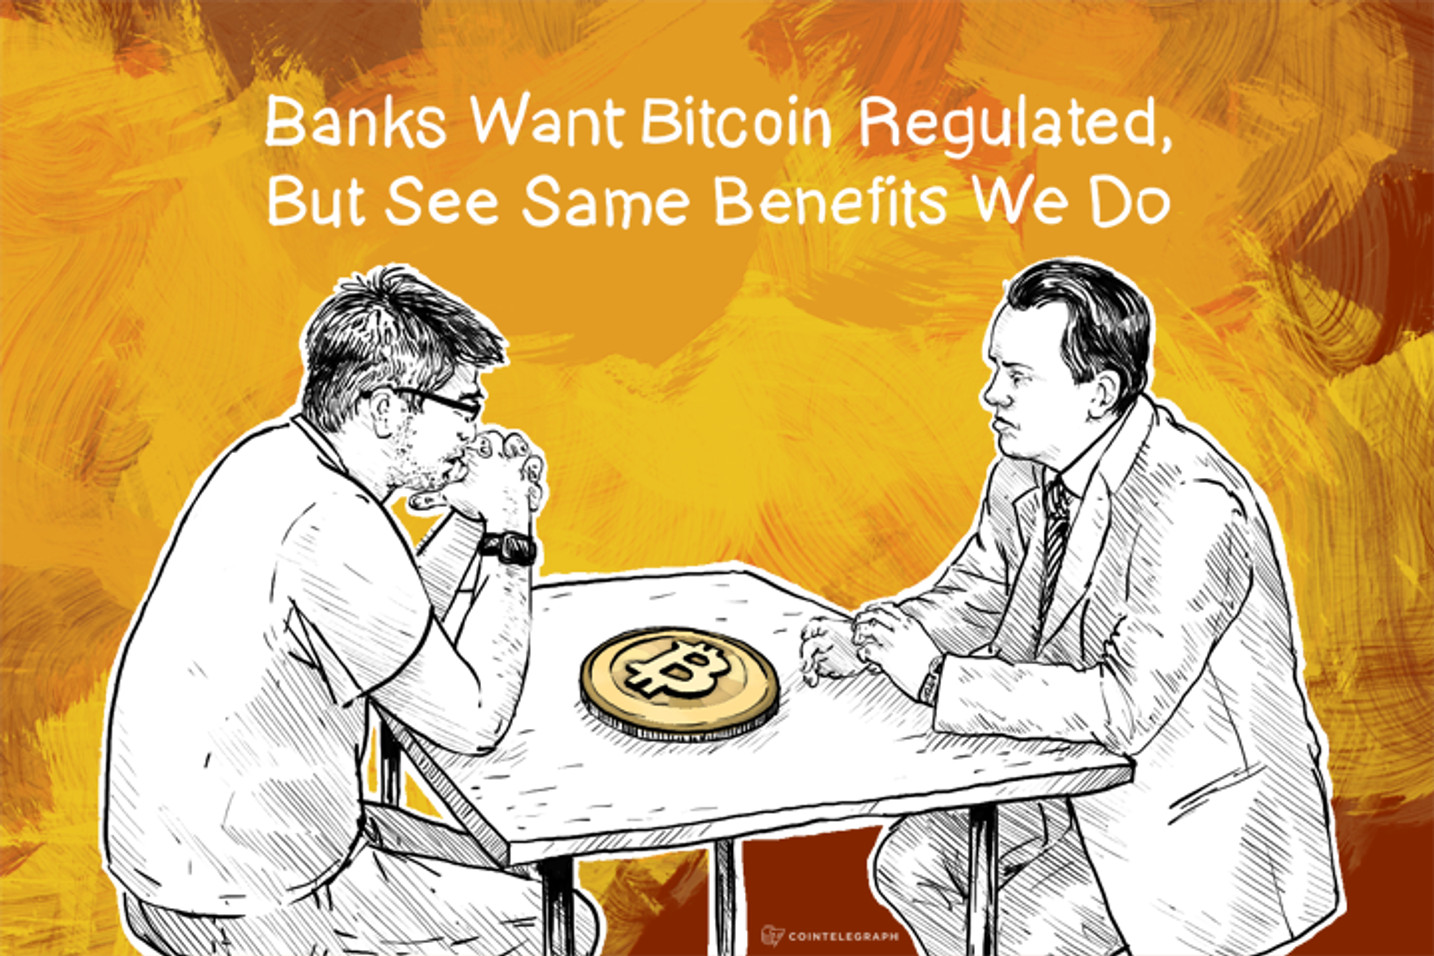 Banks Want Bitcoin Regulated, But See Same Benefits We Do